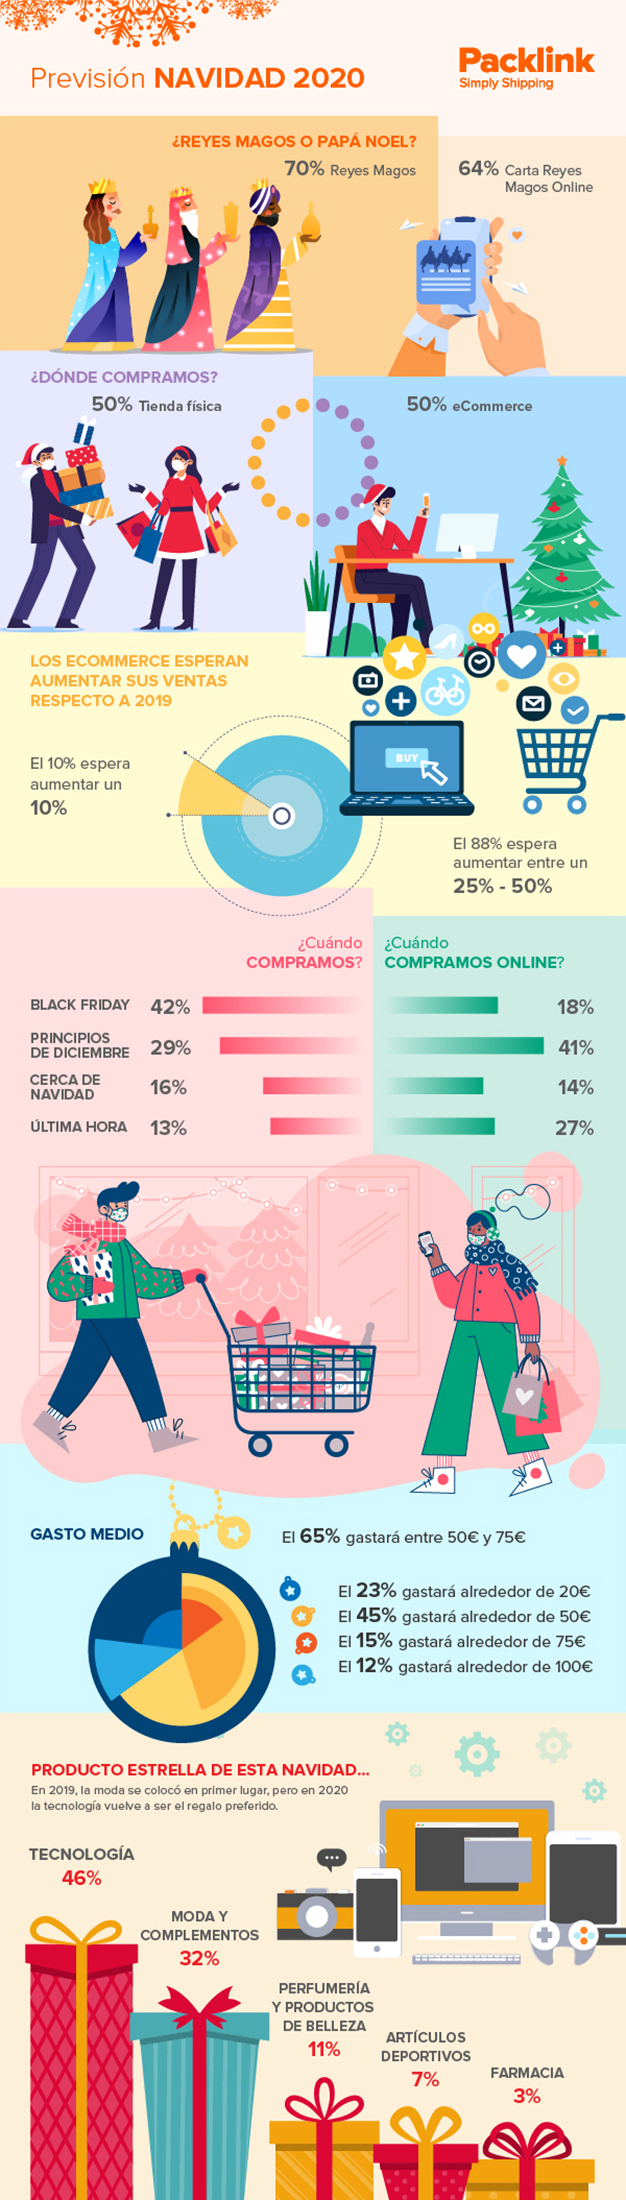 packlink lanza infografia navidad